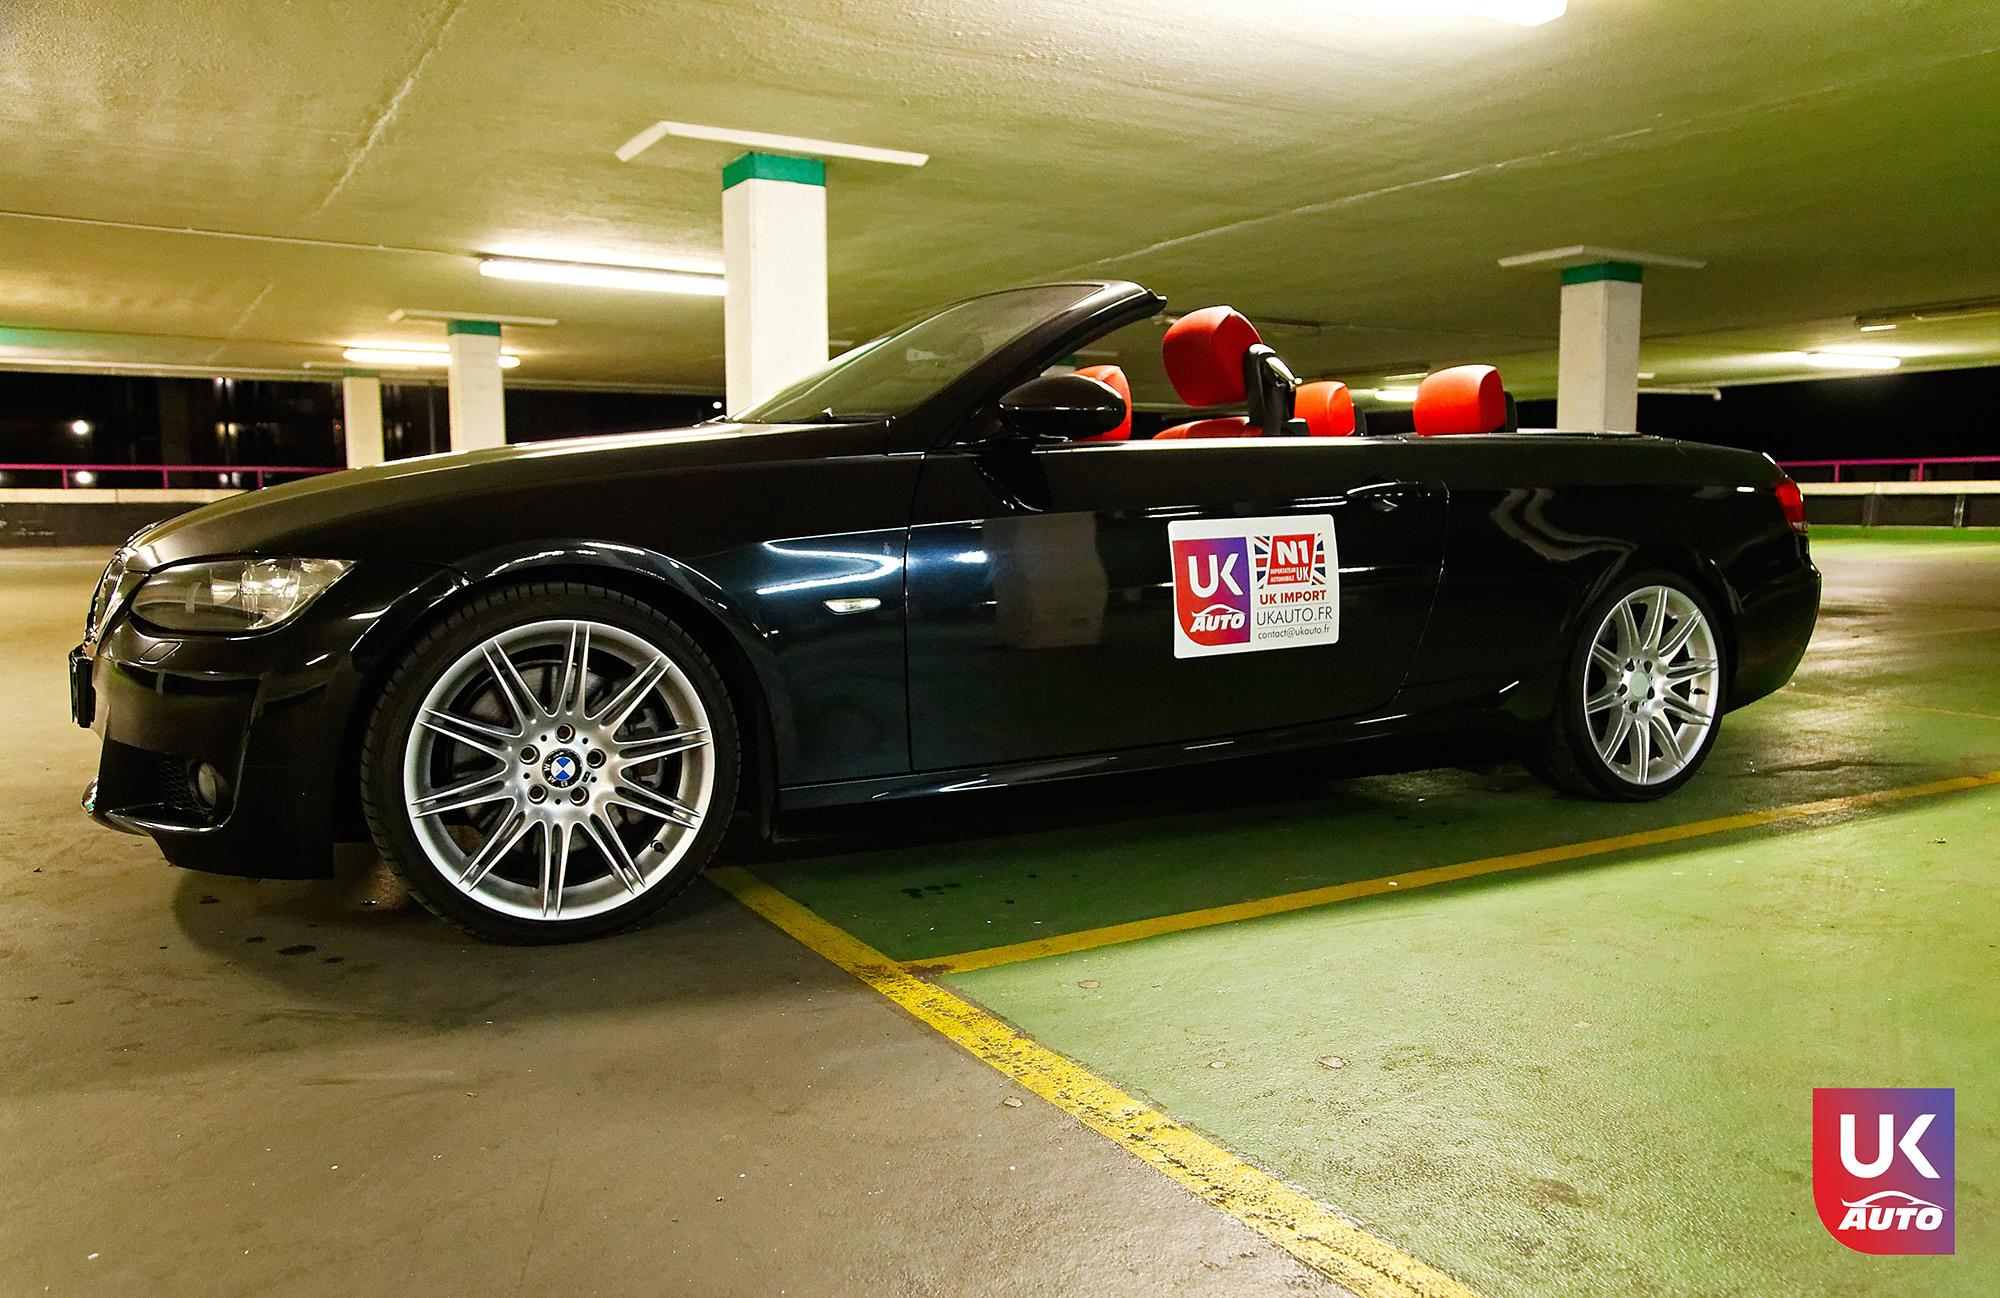 UKAUTO IMPORT ANGLETERRE BMW 335i CABRIOLET UKA RHD11 - Felecitation a Jeremie pour cette BMW 335i cabriolet RHD PACK M IMPORT AUTO ANGLAISE